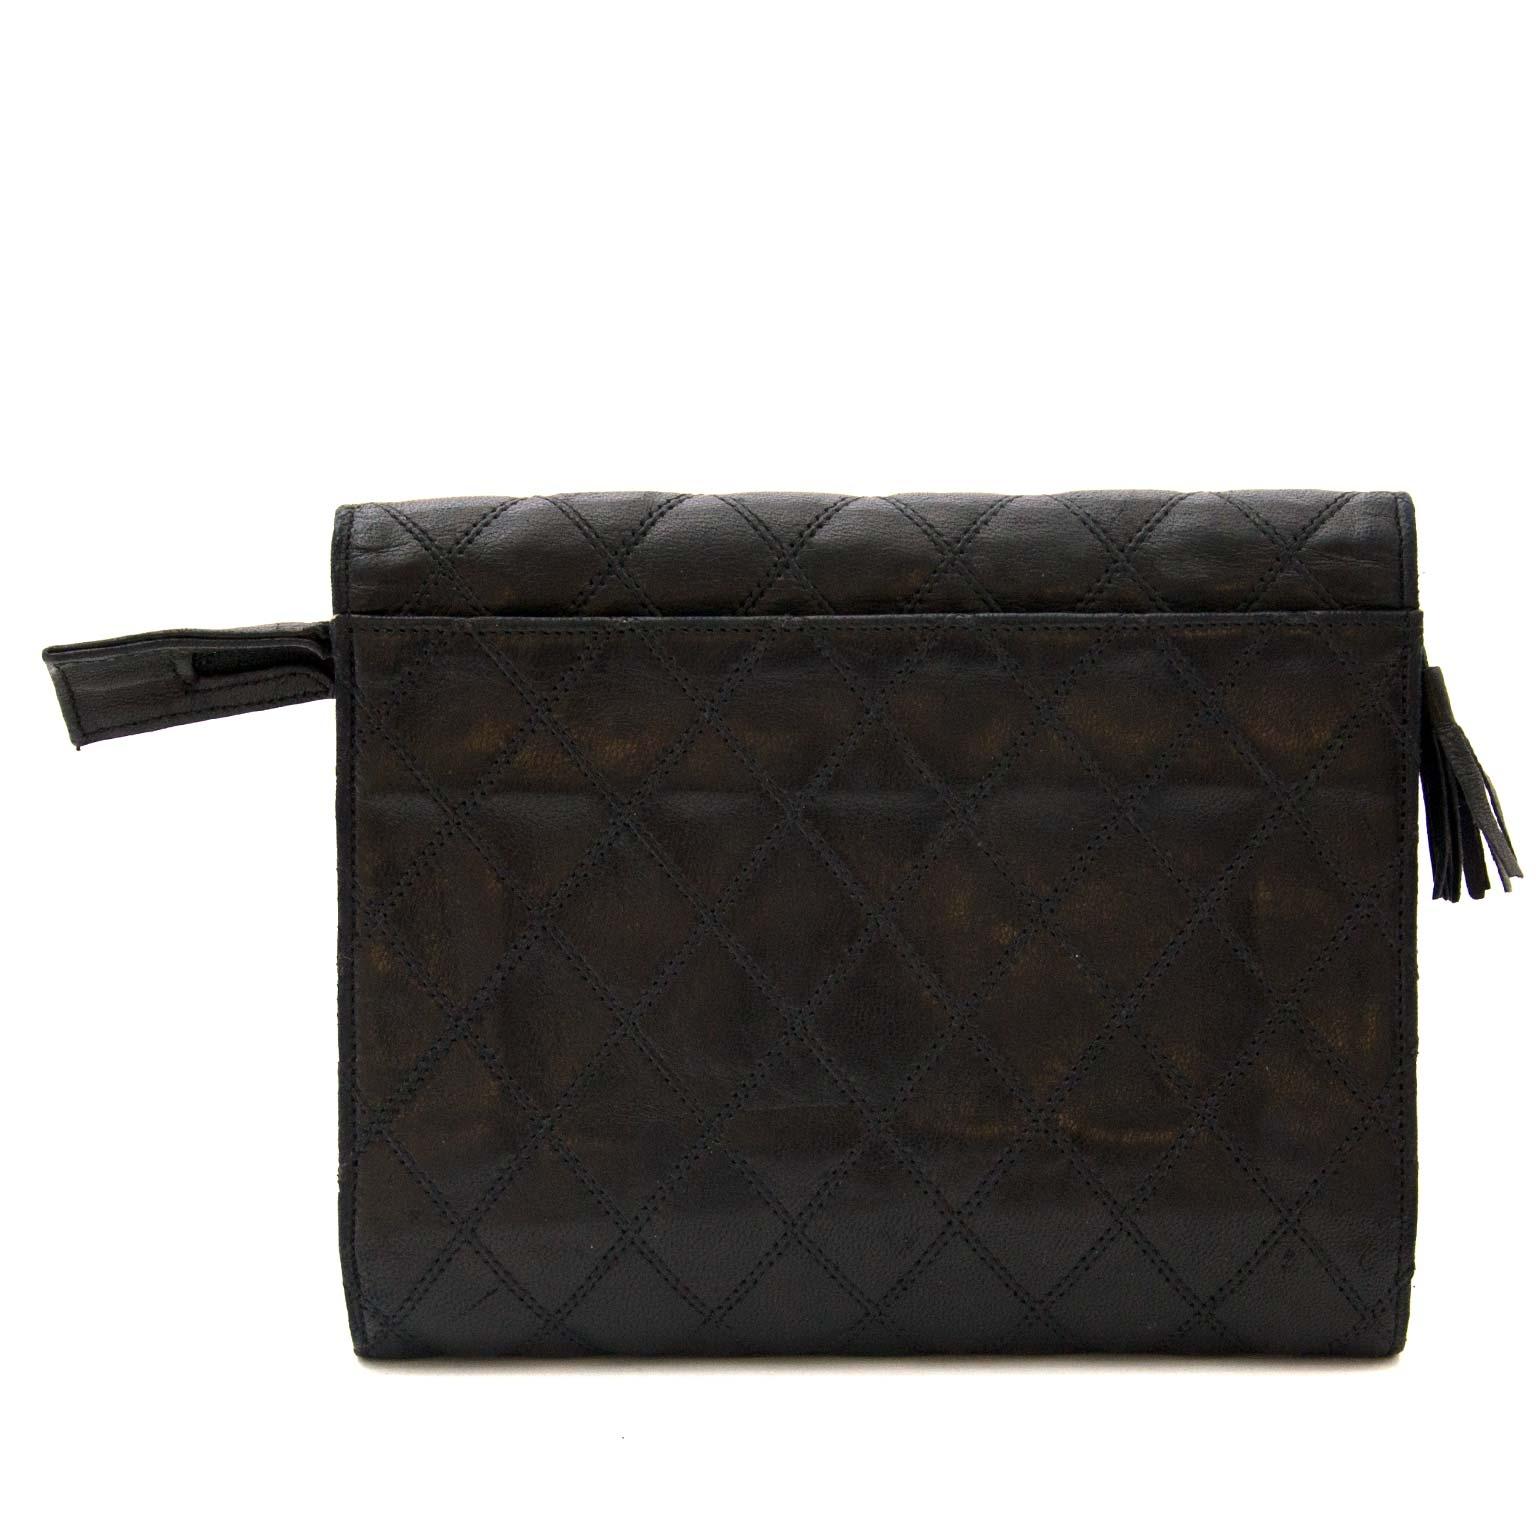 achetez Chanel Black Vintage Lambskin Pochette/Wallet  sur labellov